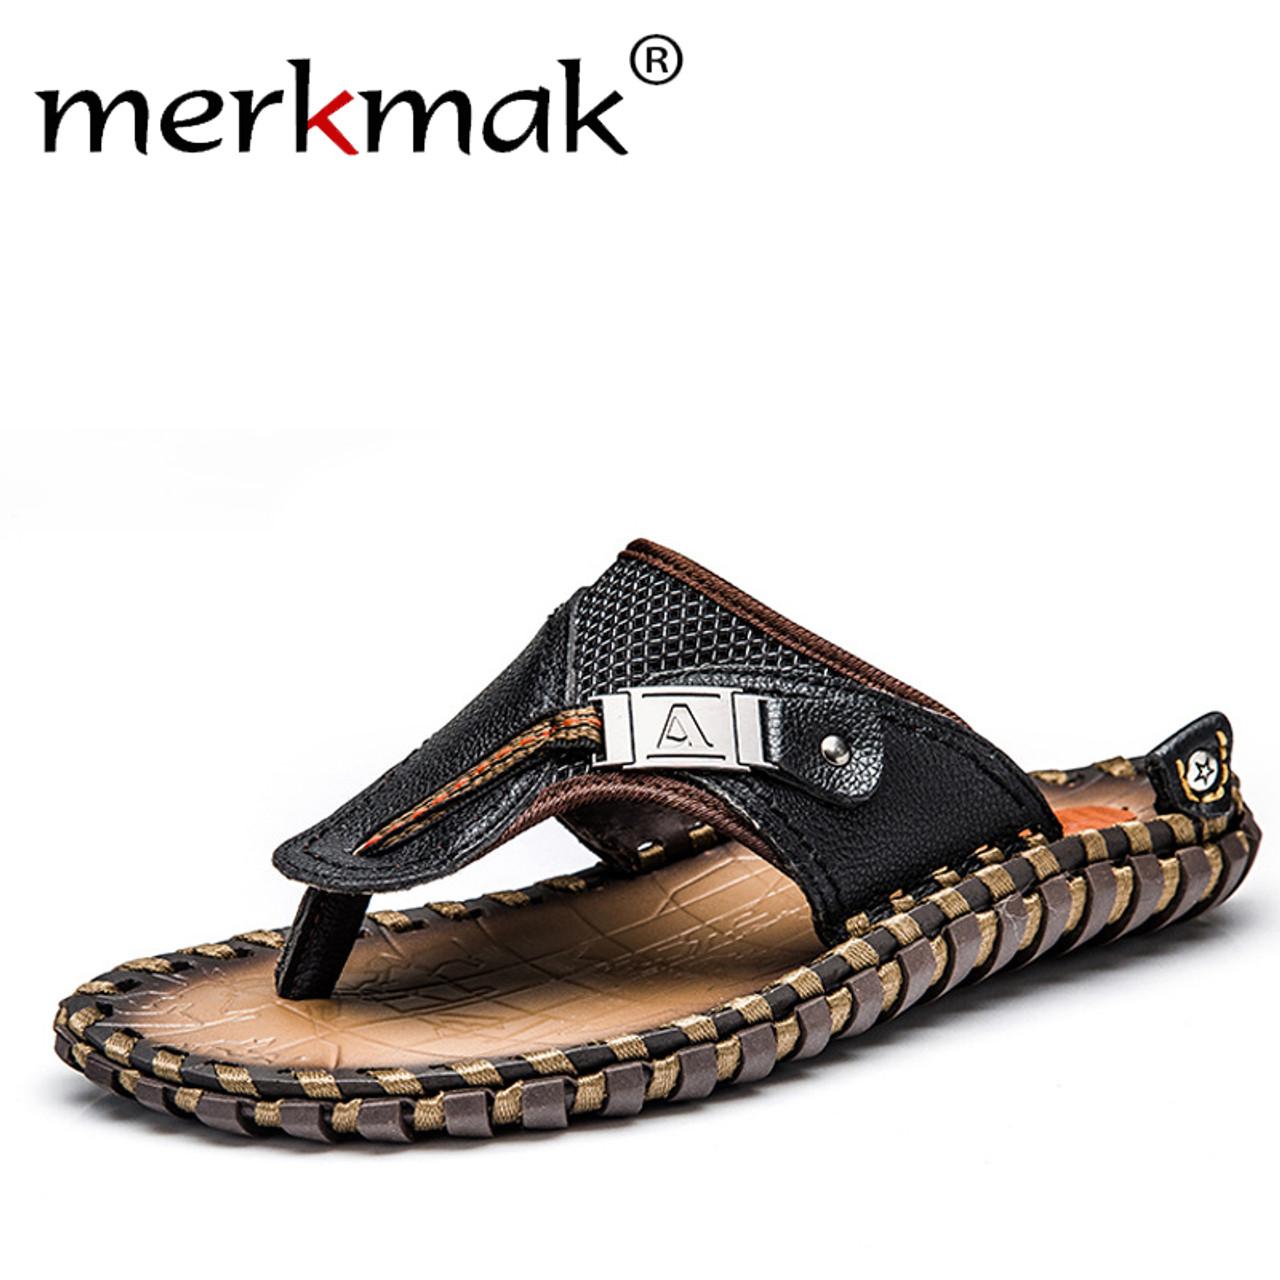 3e8f66d08 Merkmak Luxury Brand 2018 New Men s Flip Flops Genuine Leather Slippers  Summer Fashion Beach Sandals Shoes For Men Big Size 45 - OnshopDeals.Com